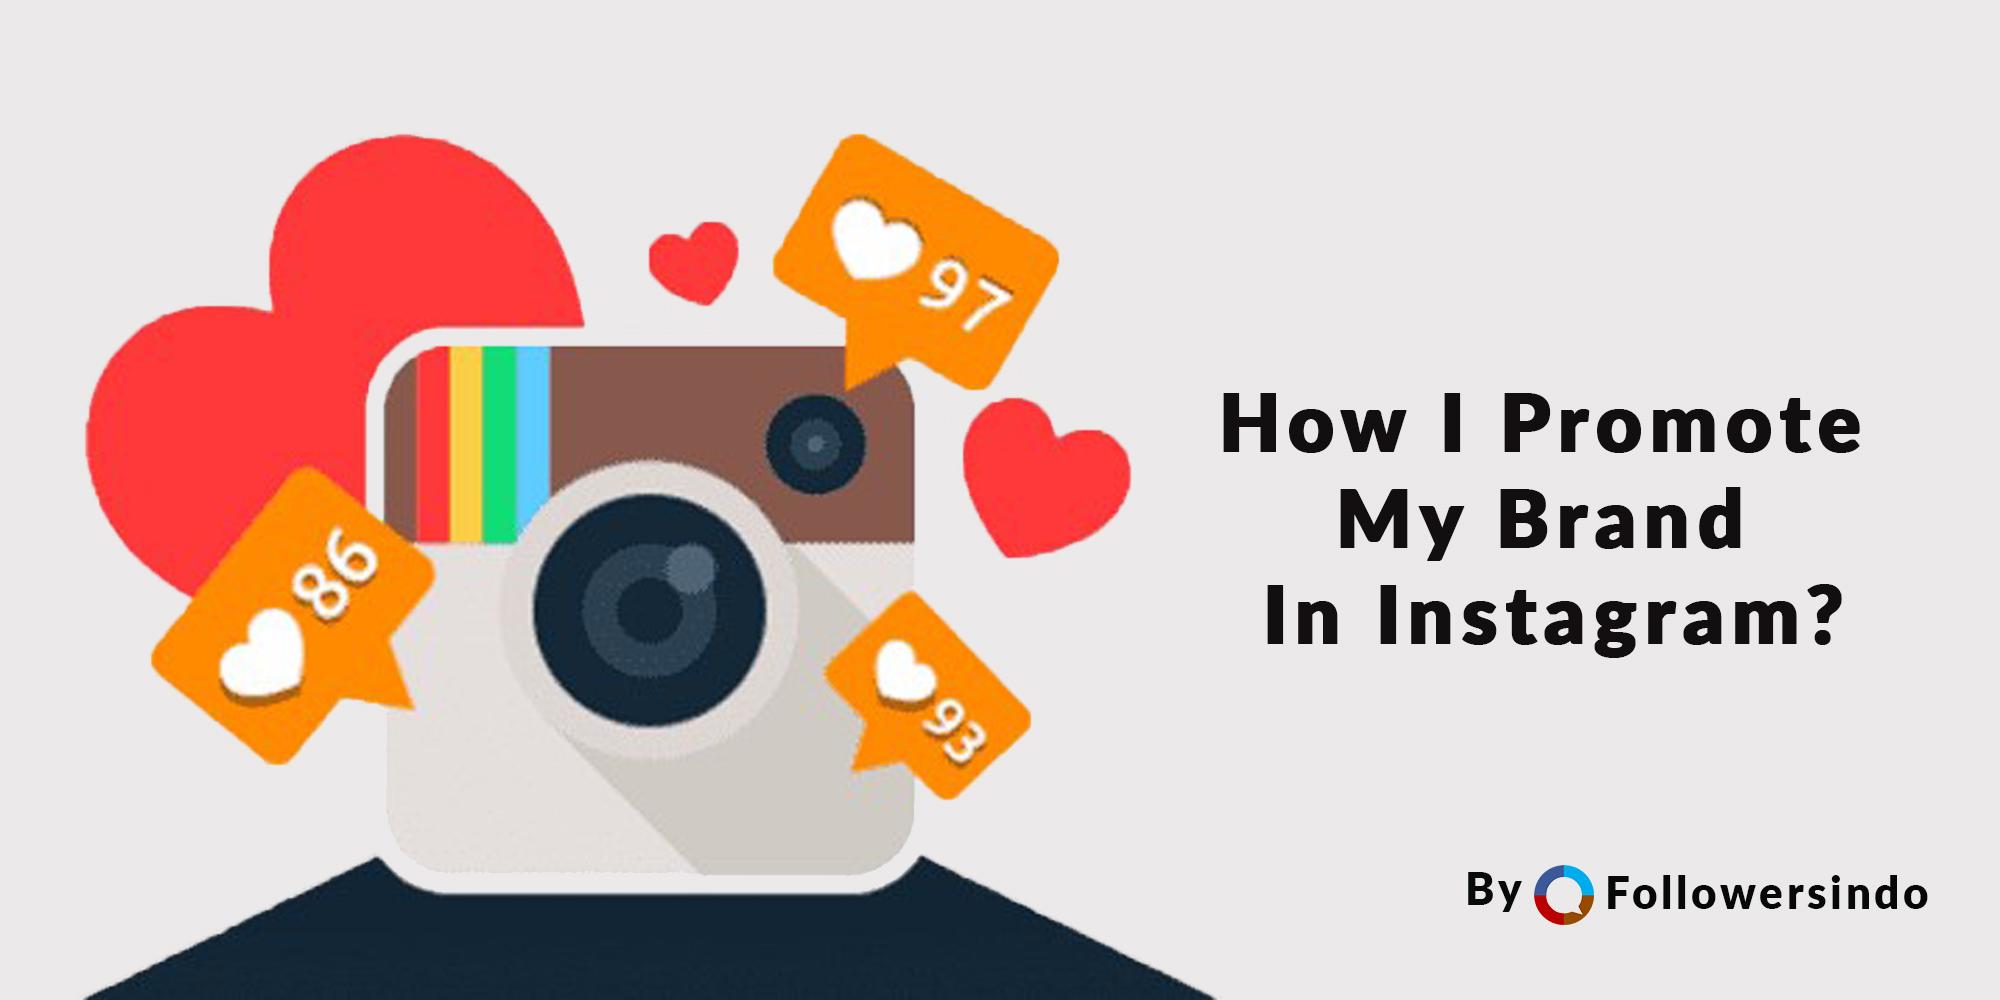 Bagaimana Cara Meningkatkan Brand dan Drive Sales di Instagram - Followersindo.com